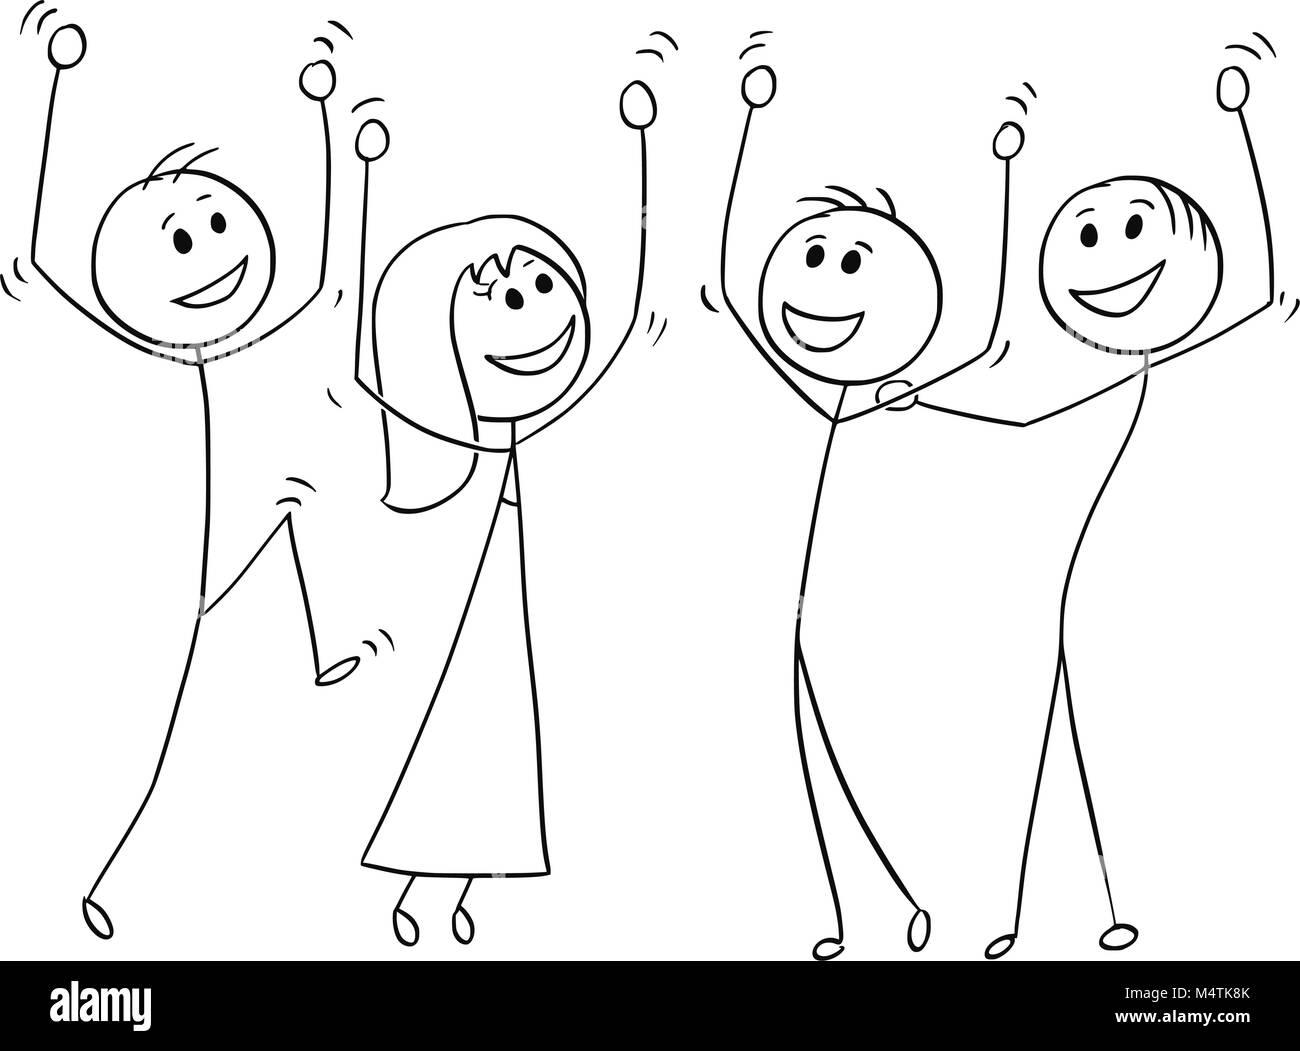 cartoon of group of people celebrating success stock vector image art alamy https www alamy com stock photo cartoon of group of people celebrating success 175104291 html